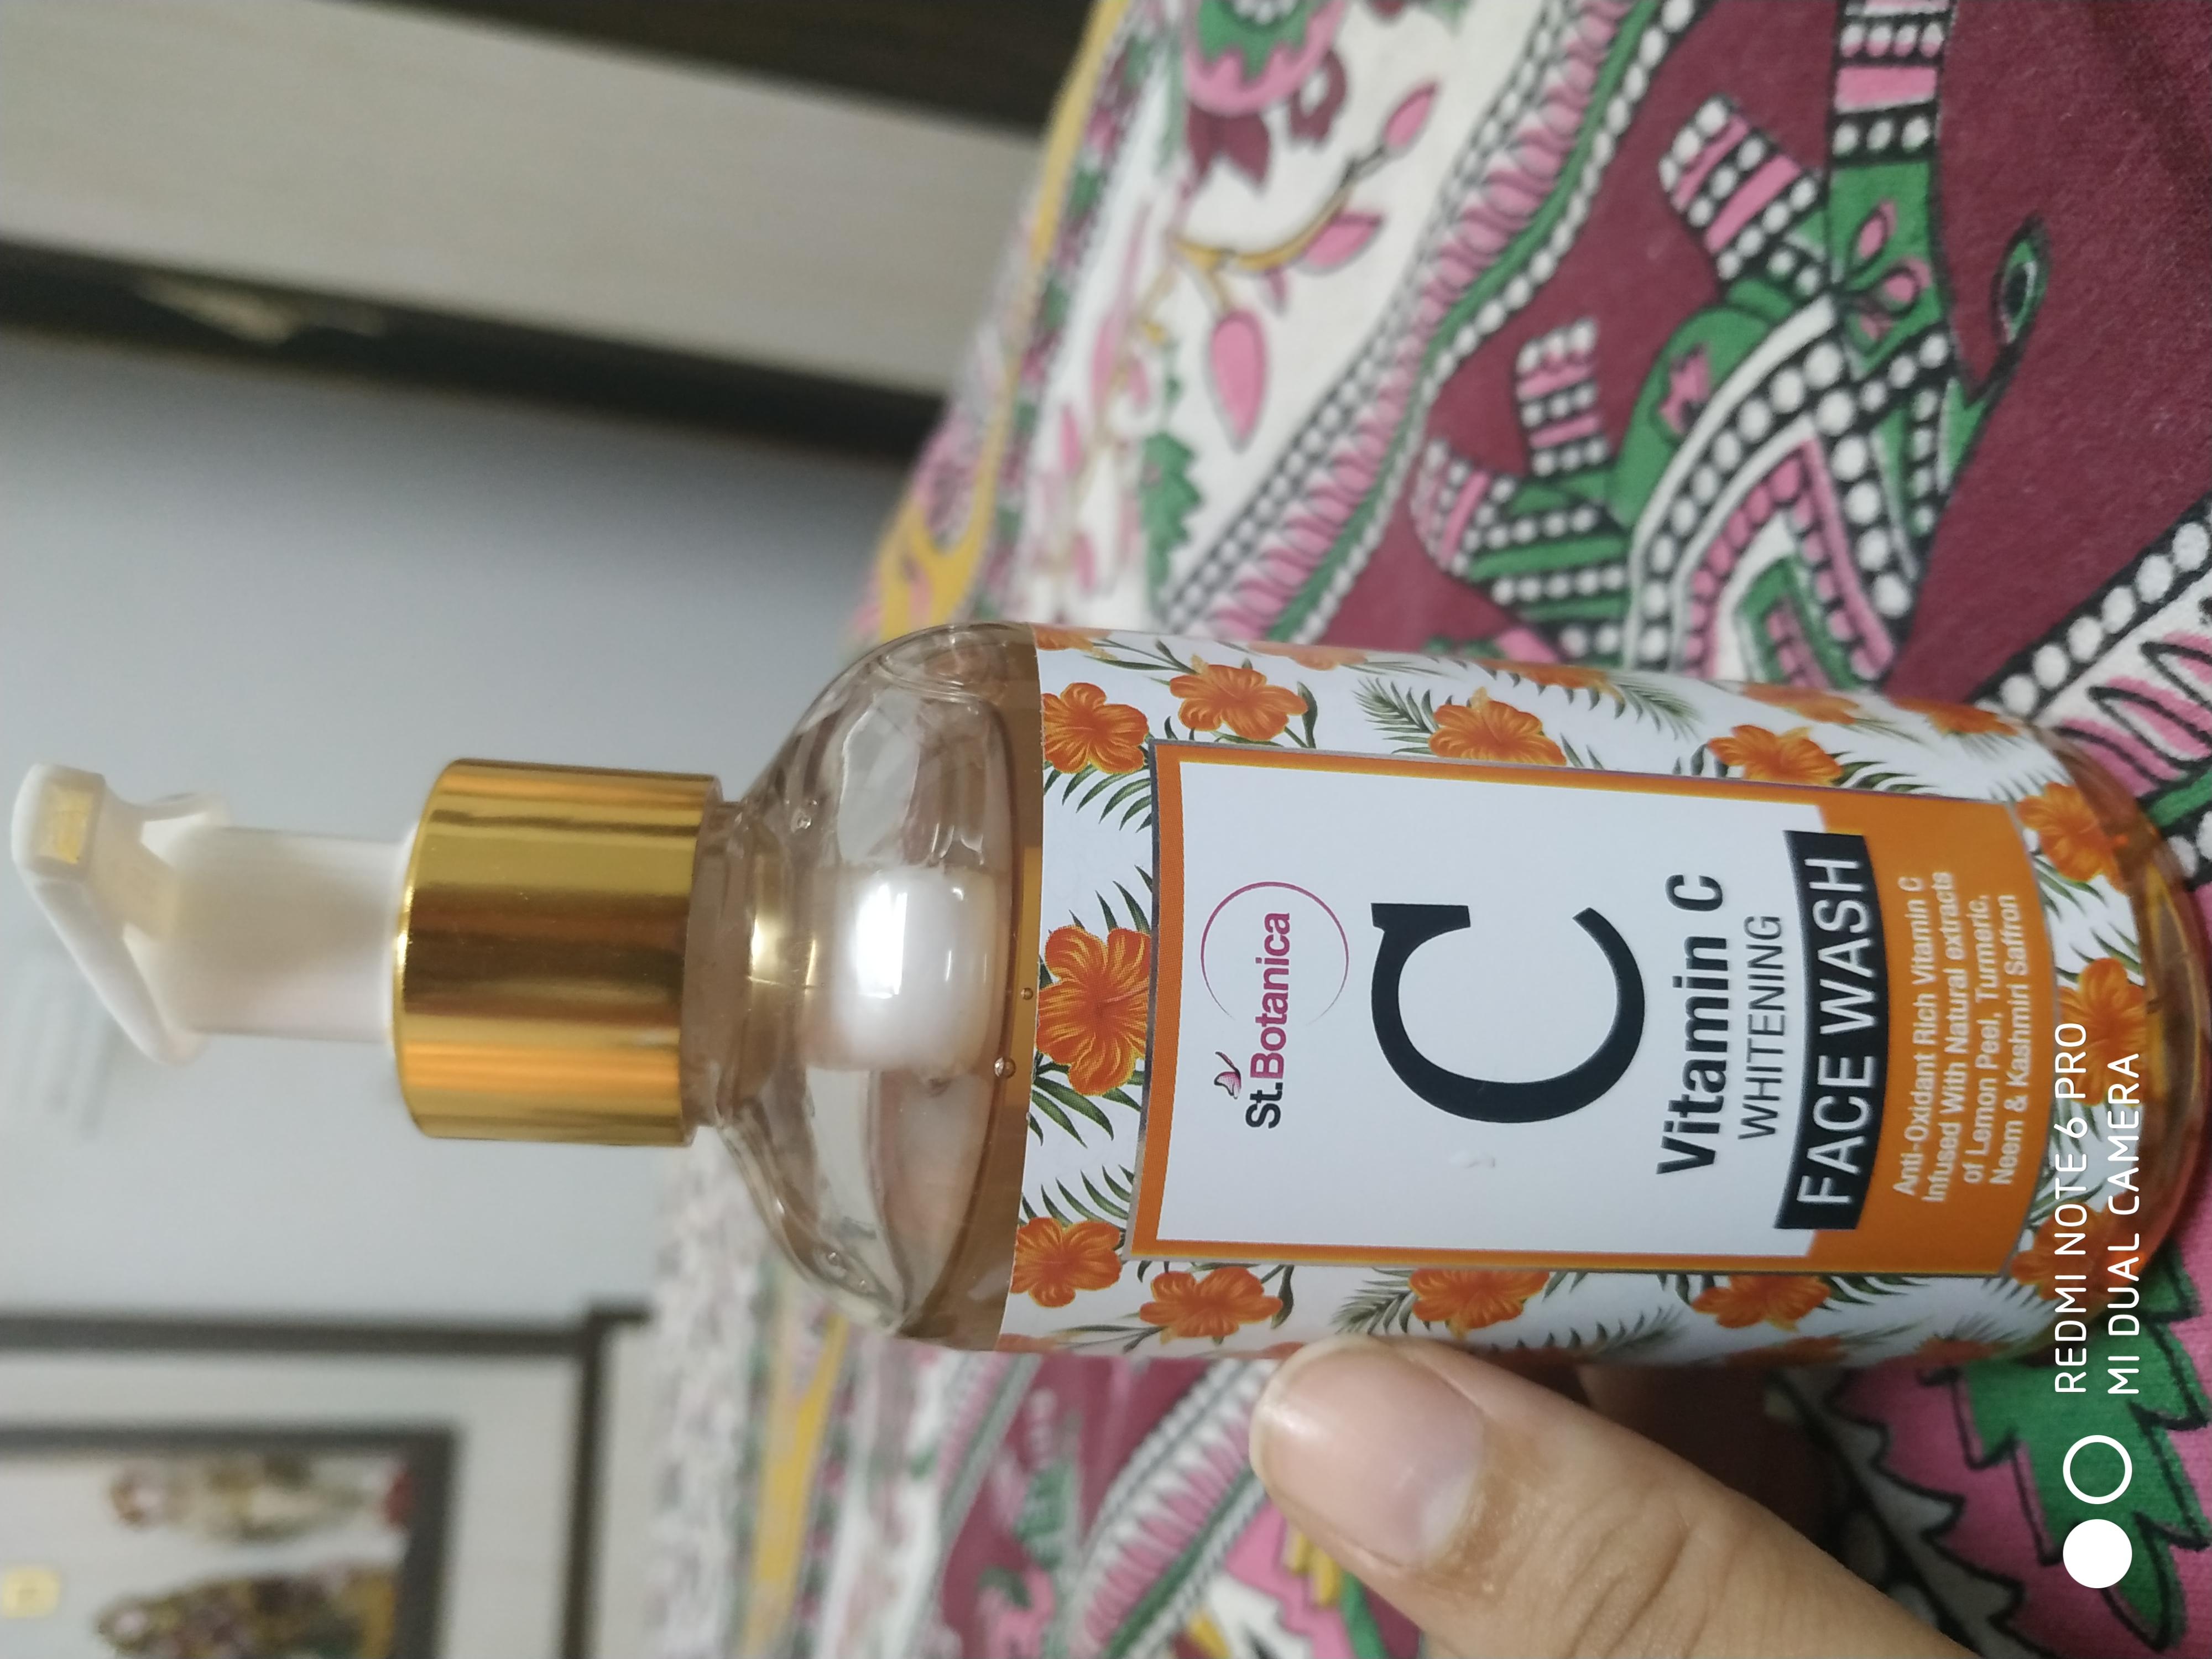 St.Botanica Vitamin C Face Wash-Rich vitamin wash-By taniyajoshi13